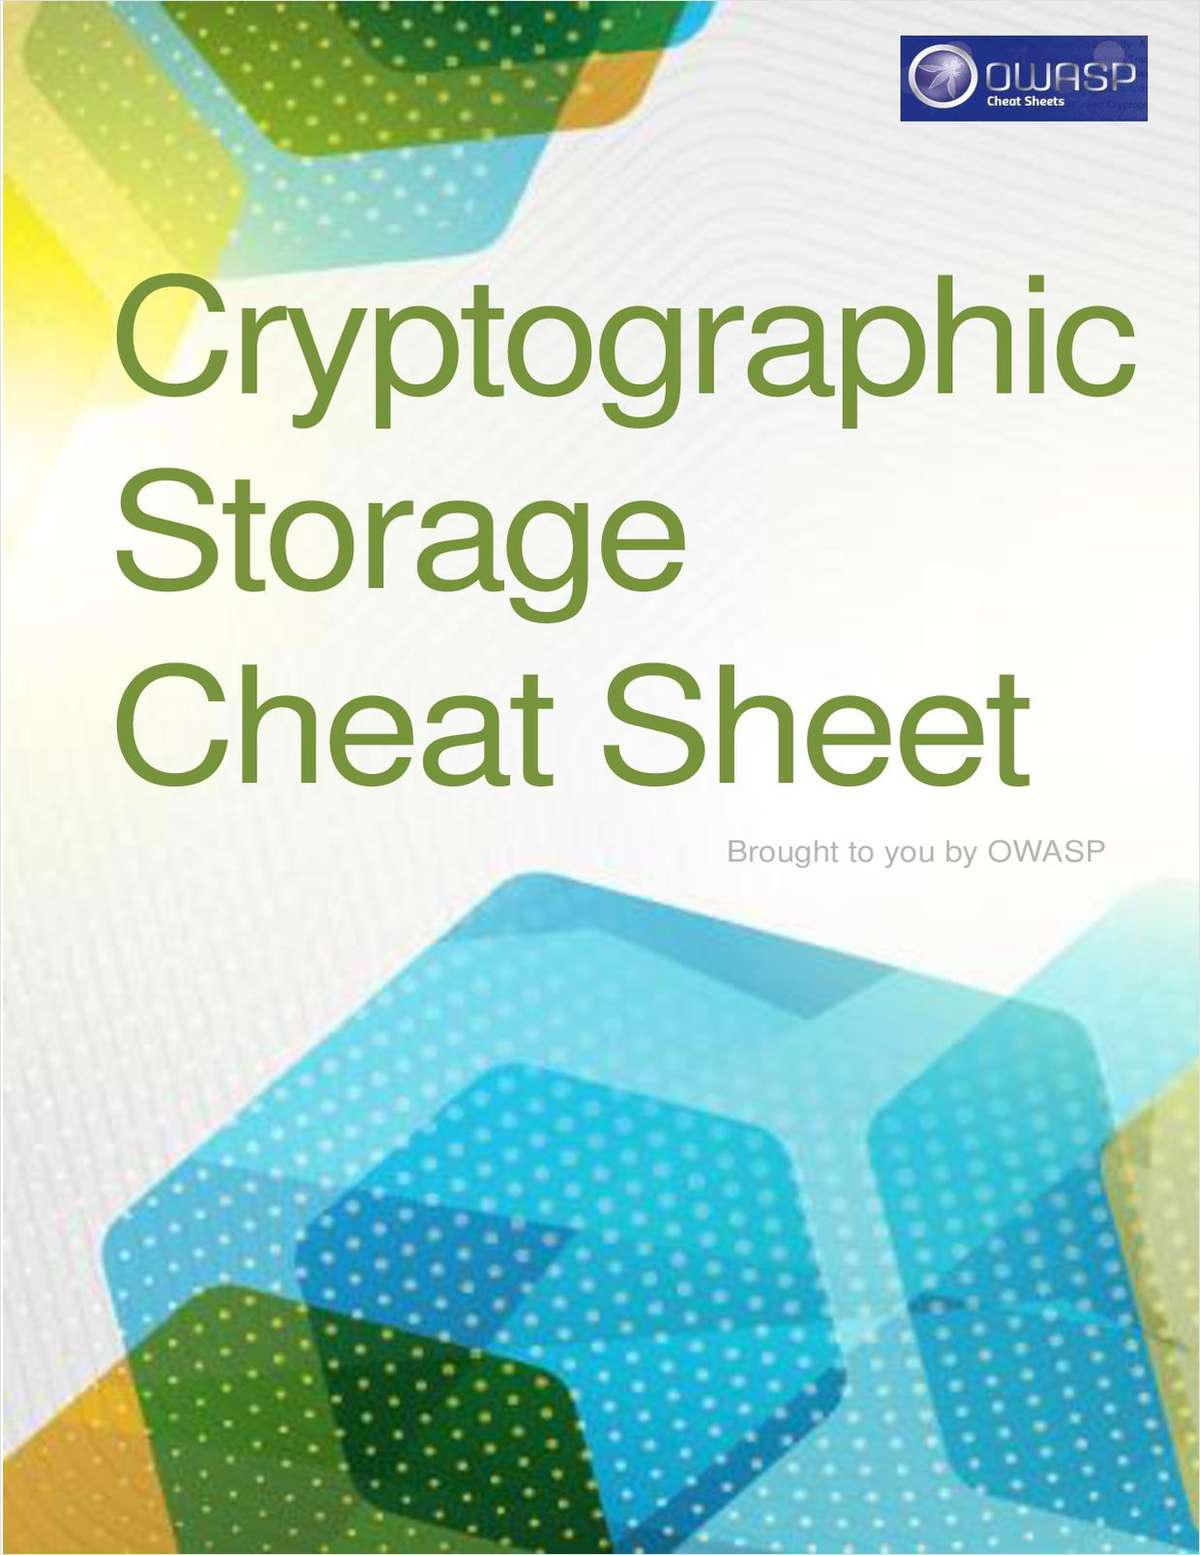 Cryptographic Storage Cheat Sheet